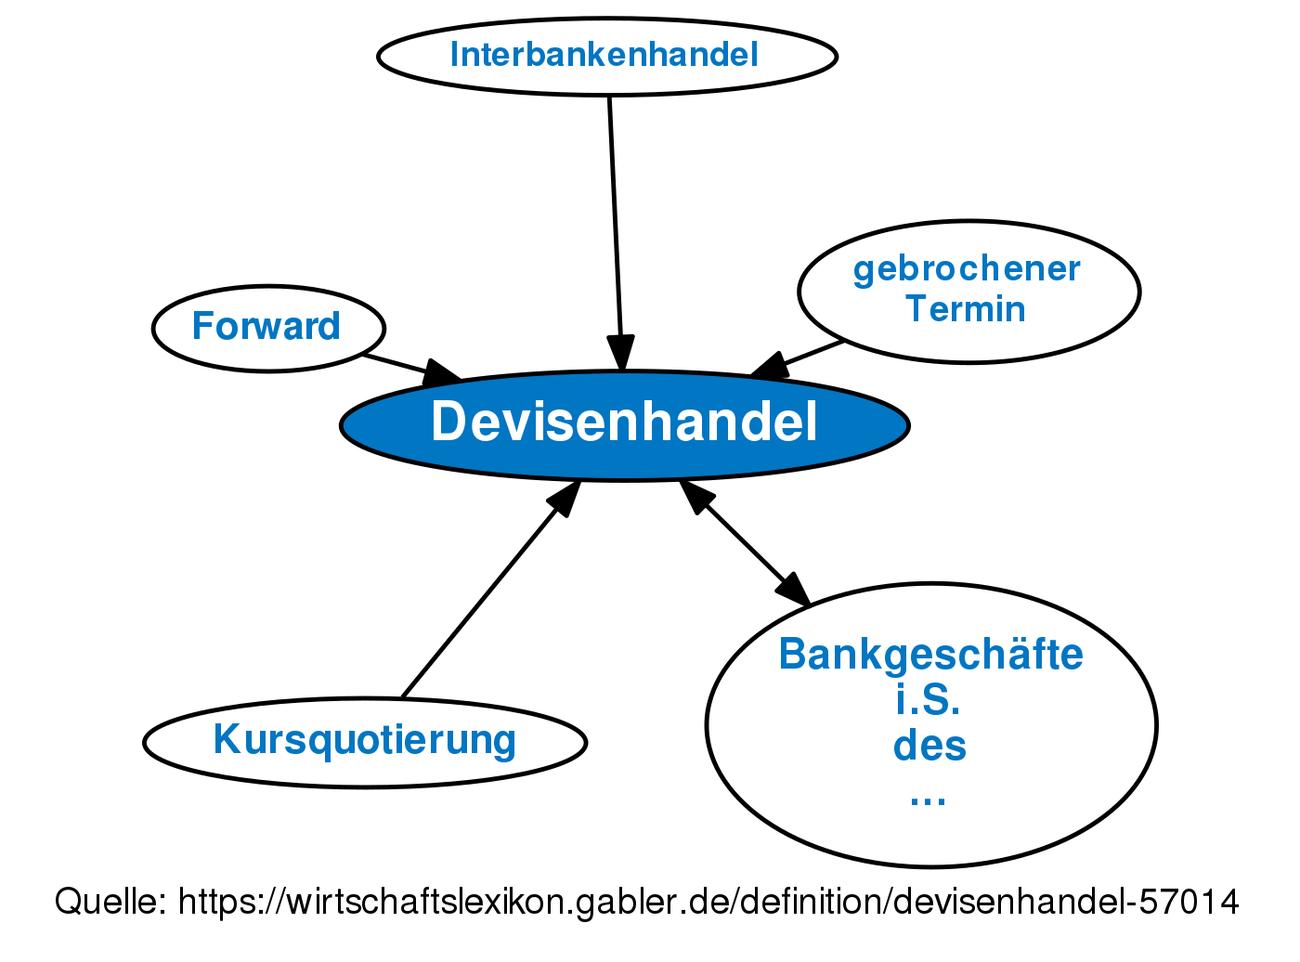 Devisenhandel Definition